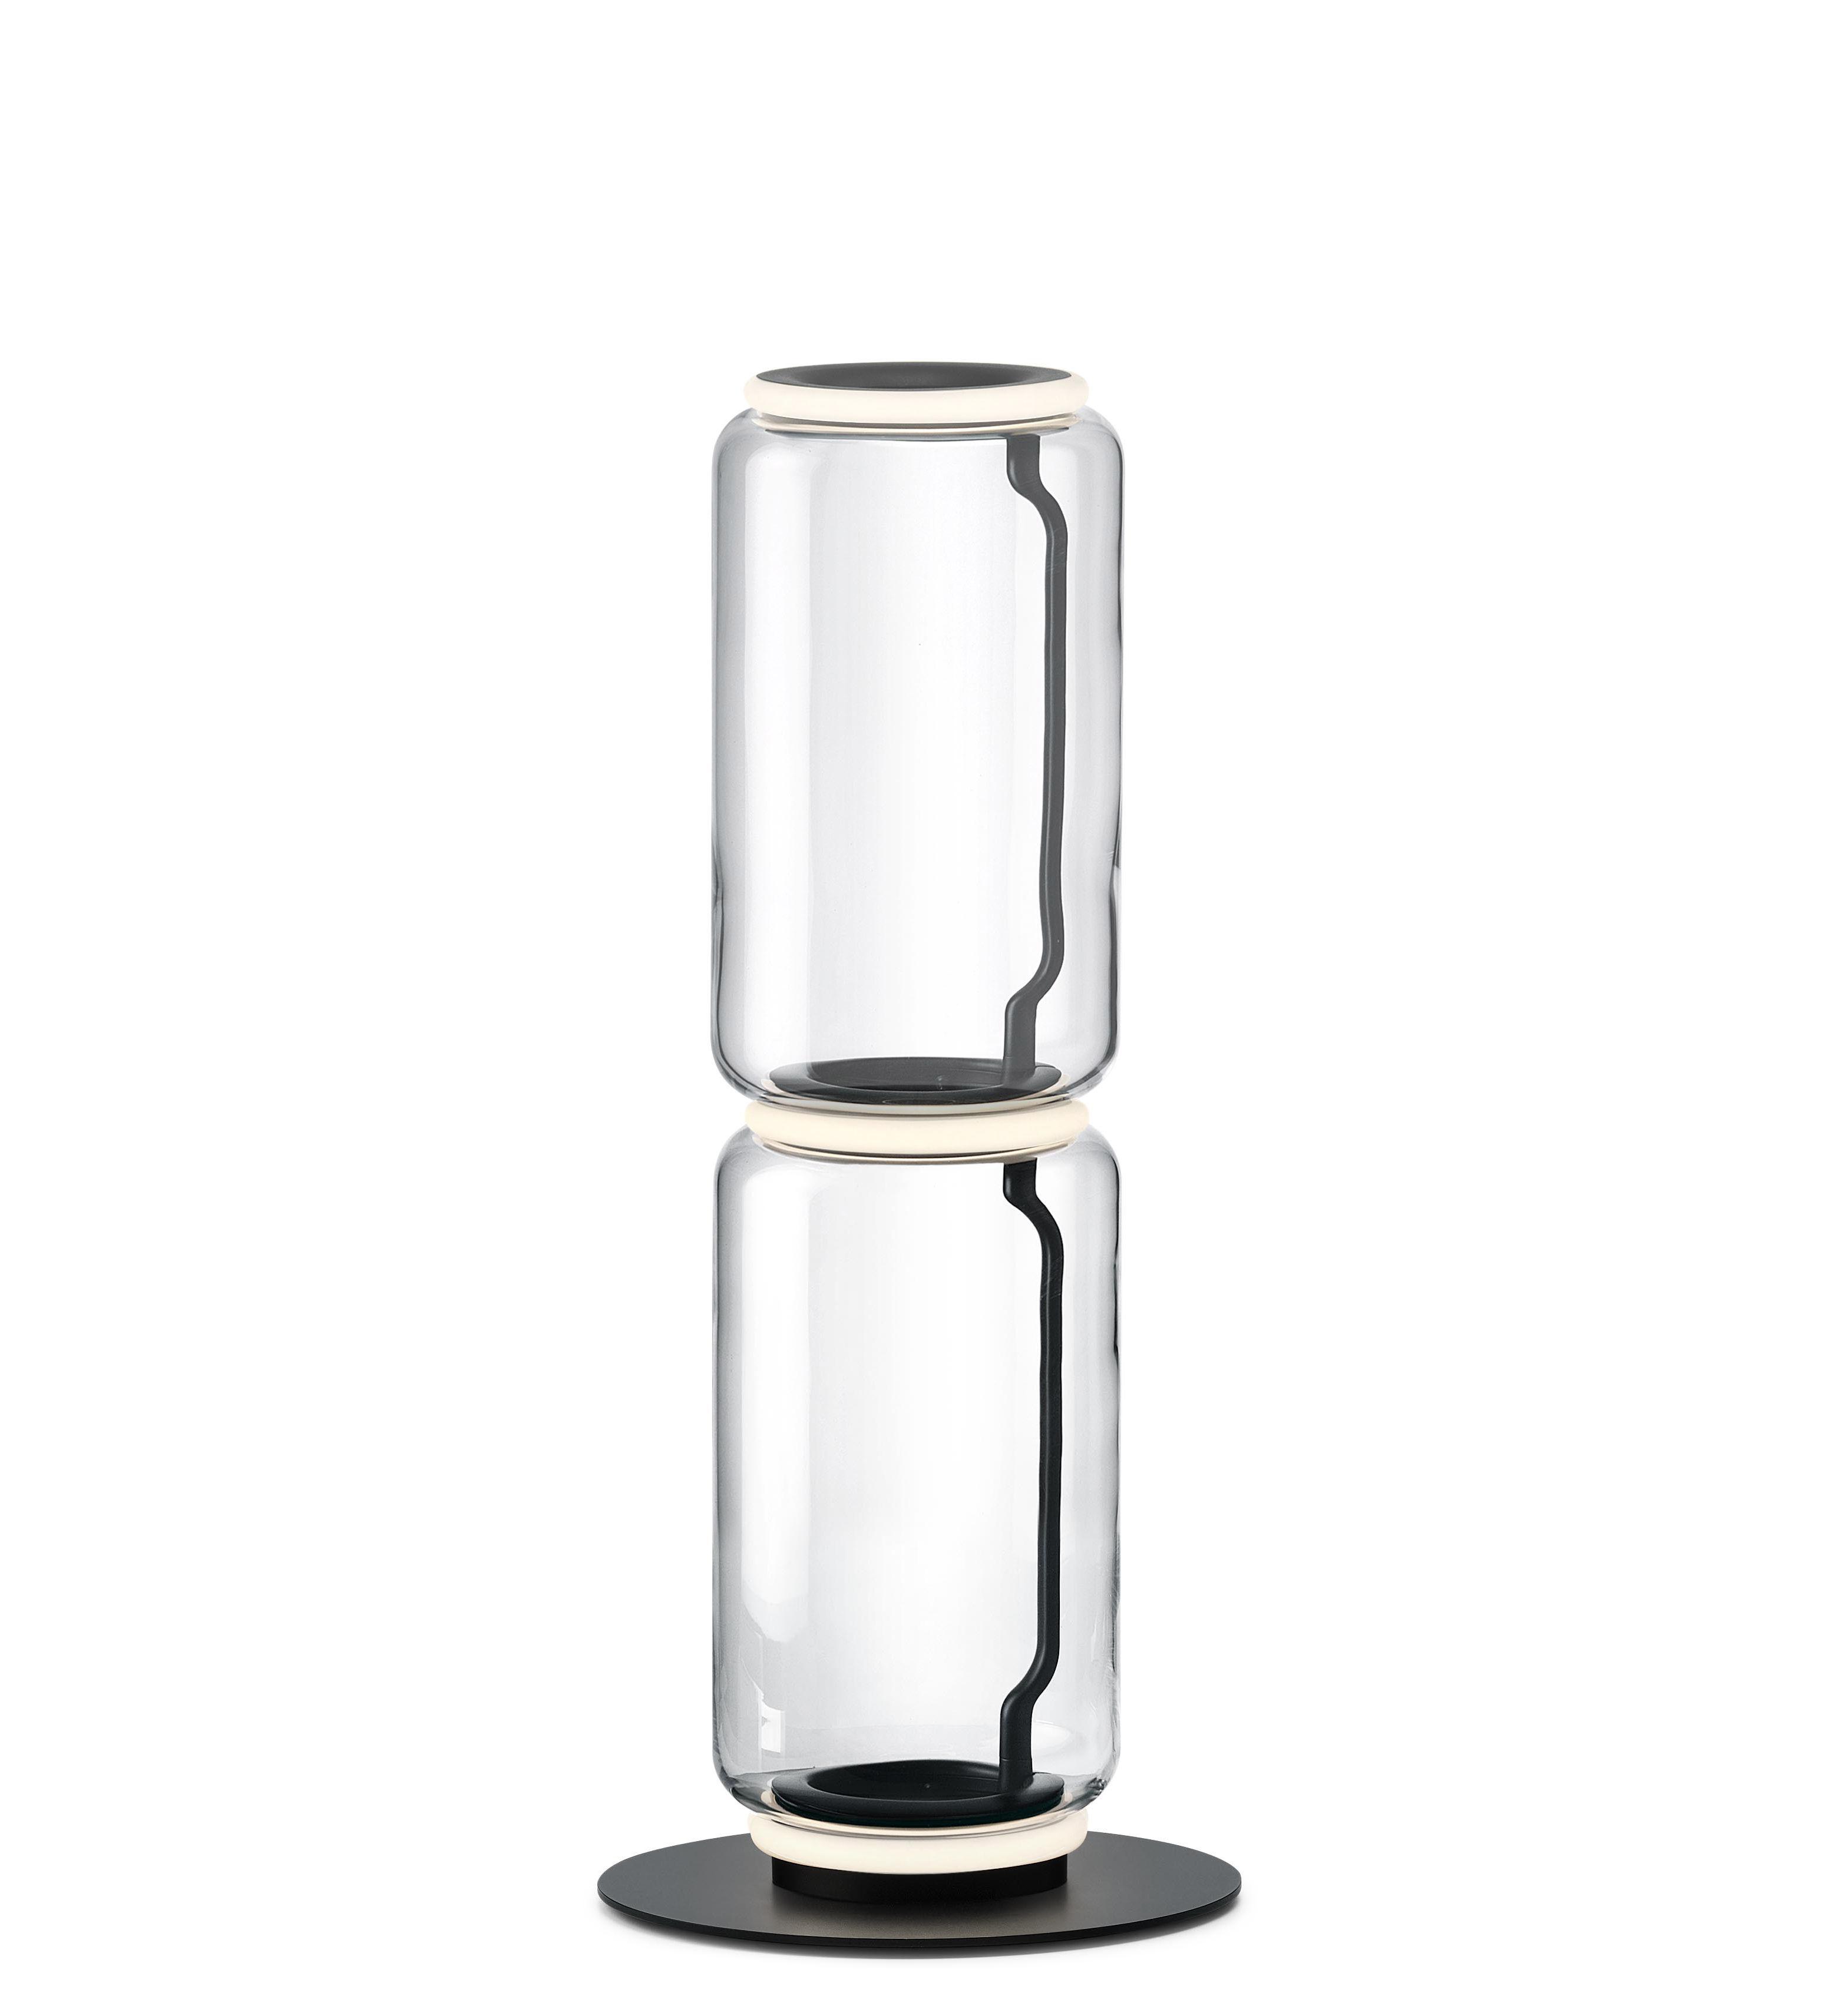 Leuchten - Stehleuchten - Noctambule Cylindre n°2 Bodenleuchte / LED - Ø 25 x H 95 cm - Flos - H 95 cm / Transparent - geblasenes Glas, Gussaluminium, Stahl